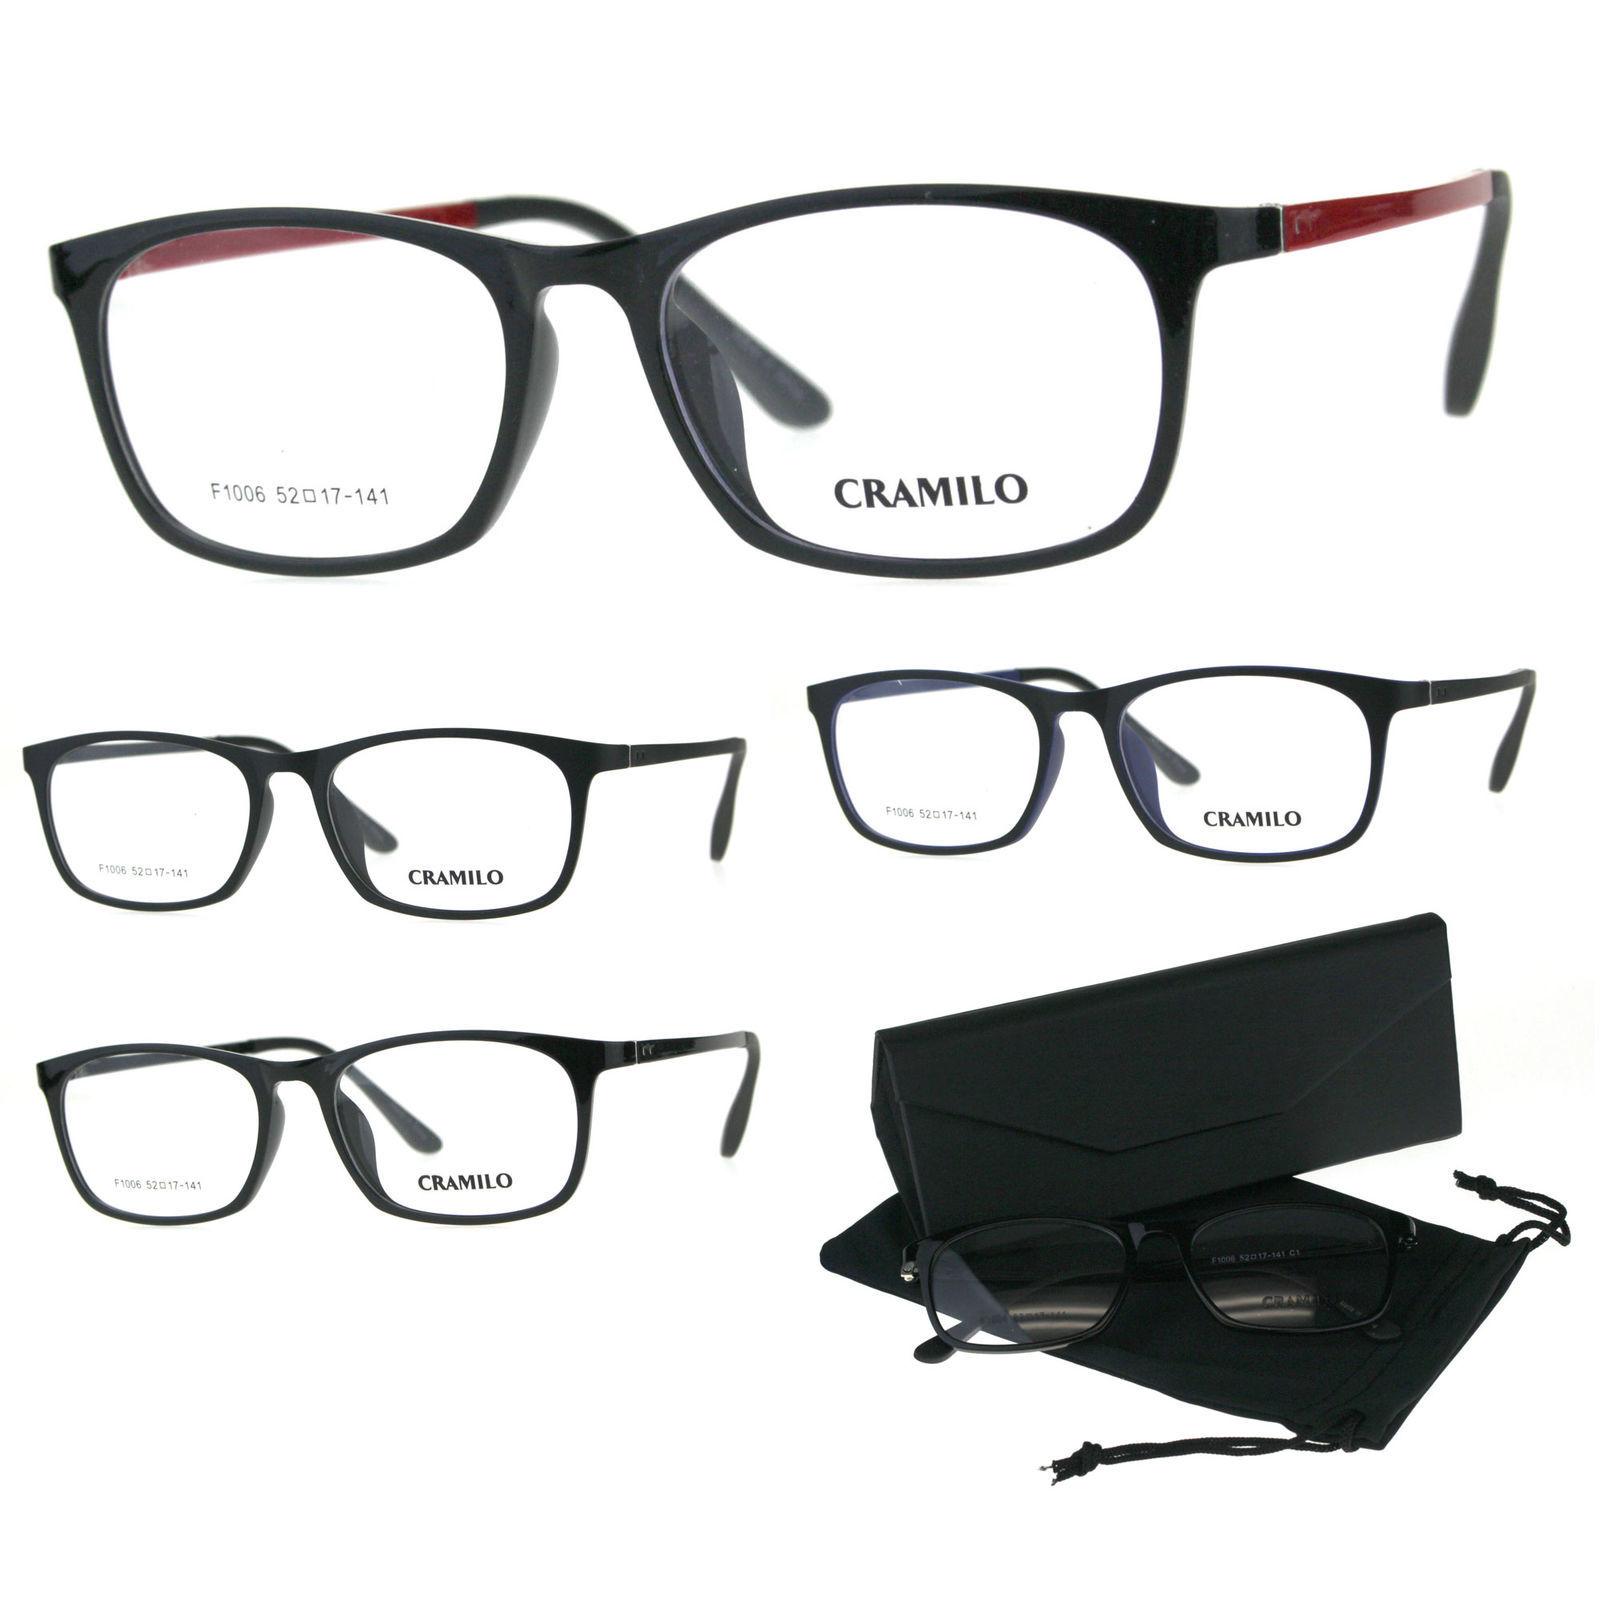 49cc7f5e598e S l1600. S l1600. Optical Quality Rectangular Narrow Thin Plastic Mens Eyeglasses  Frame. Free Shipping